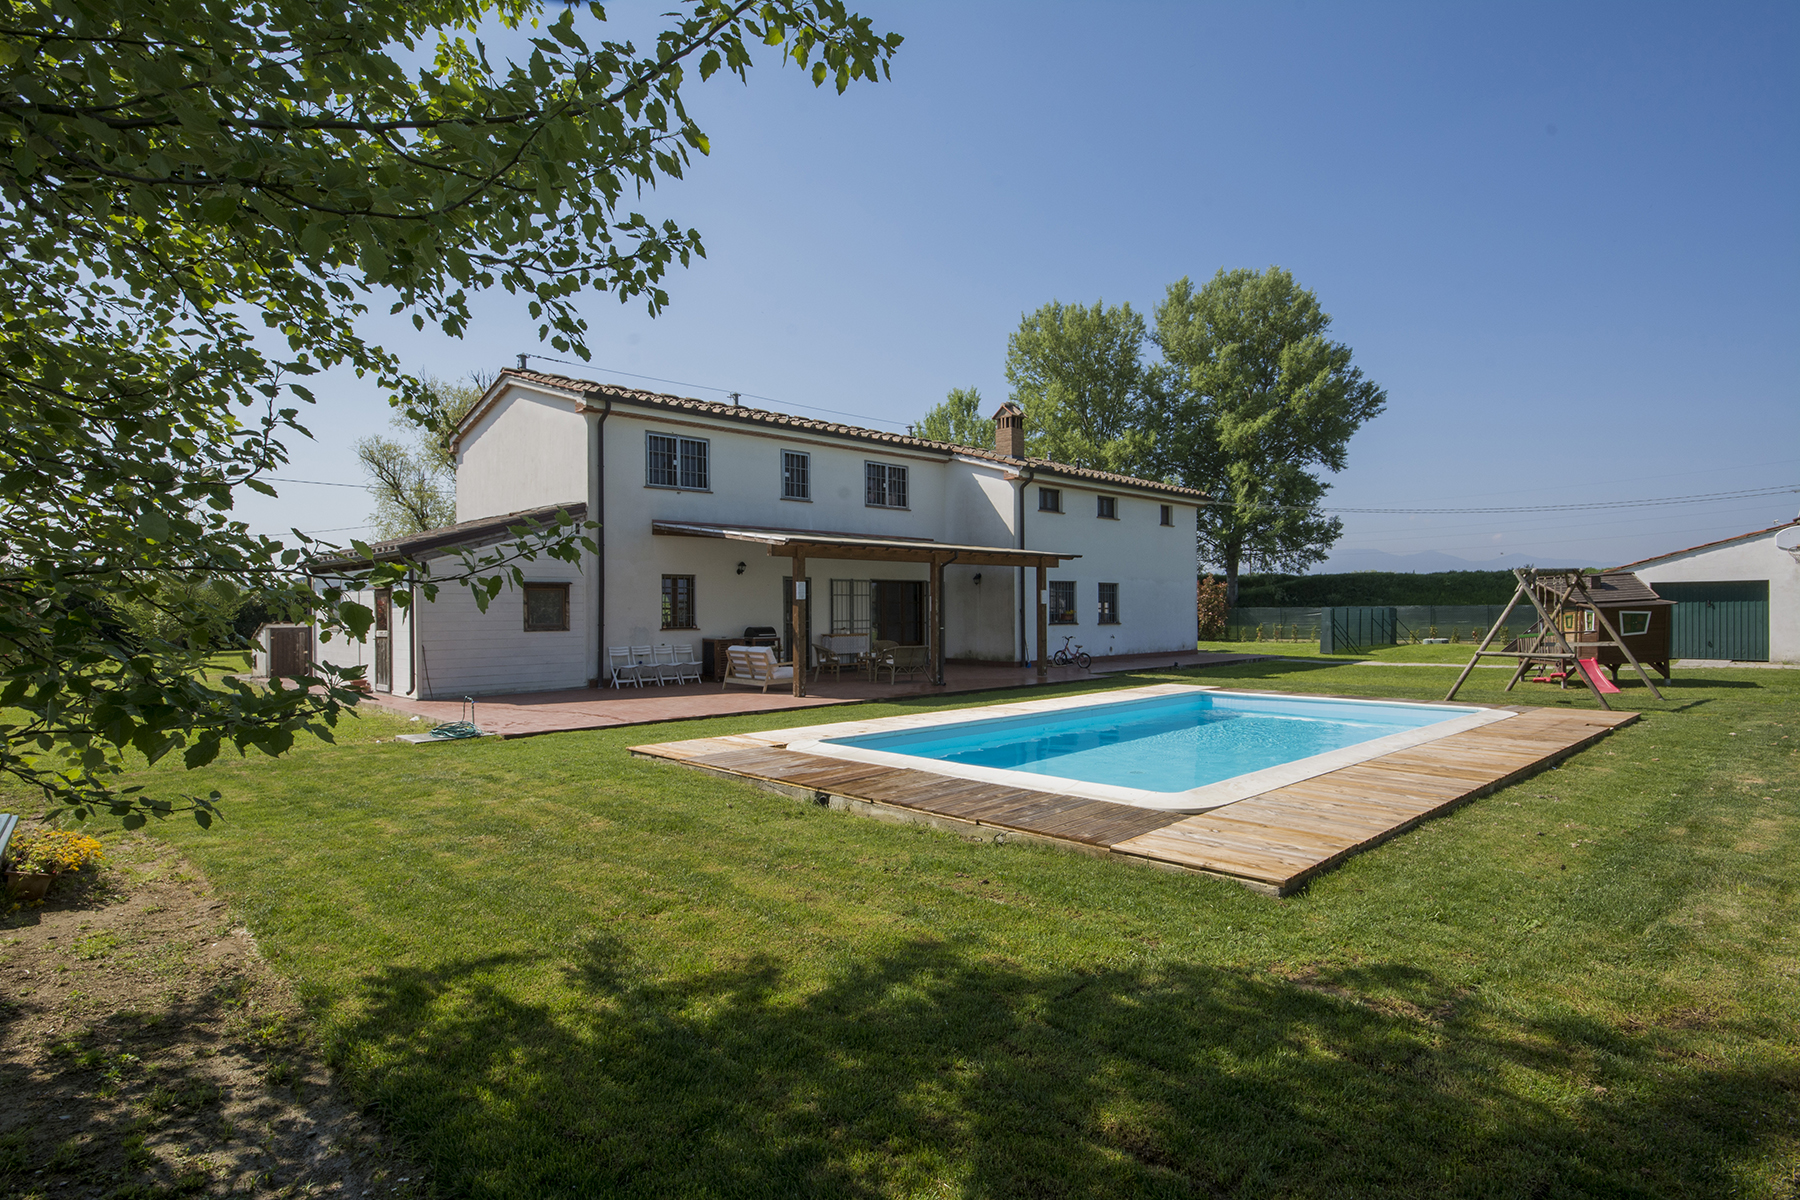 Vivienda unifamiliar por un Venta en Independent farmhouse with swimming pool Other Pistoia, Pistoia Italia